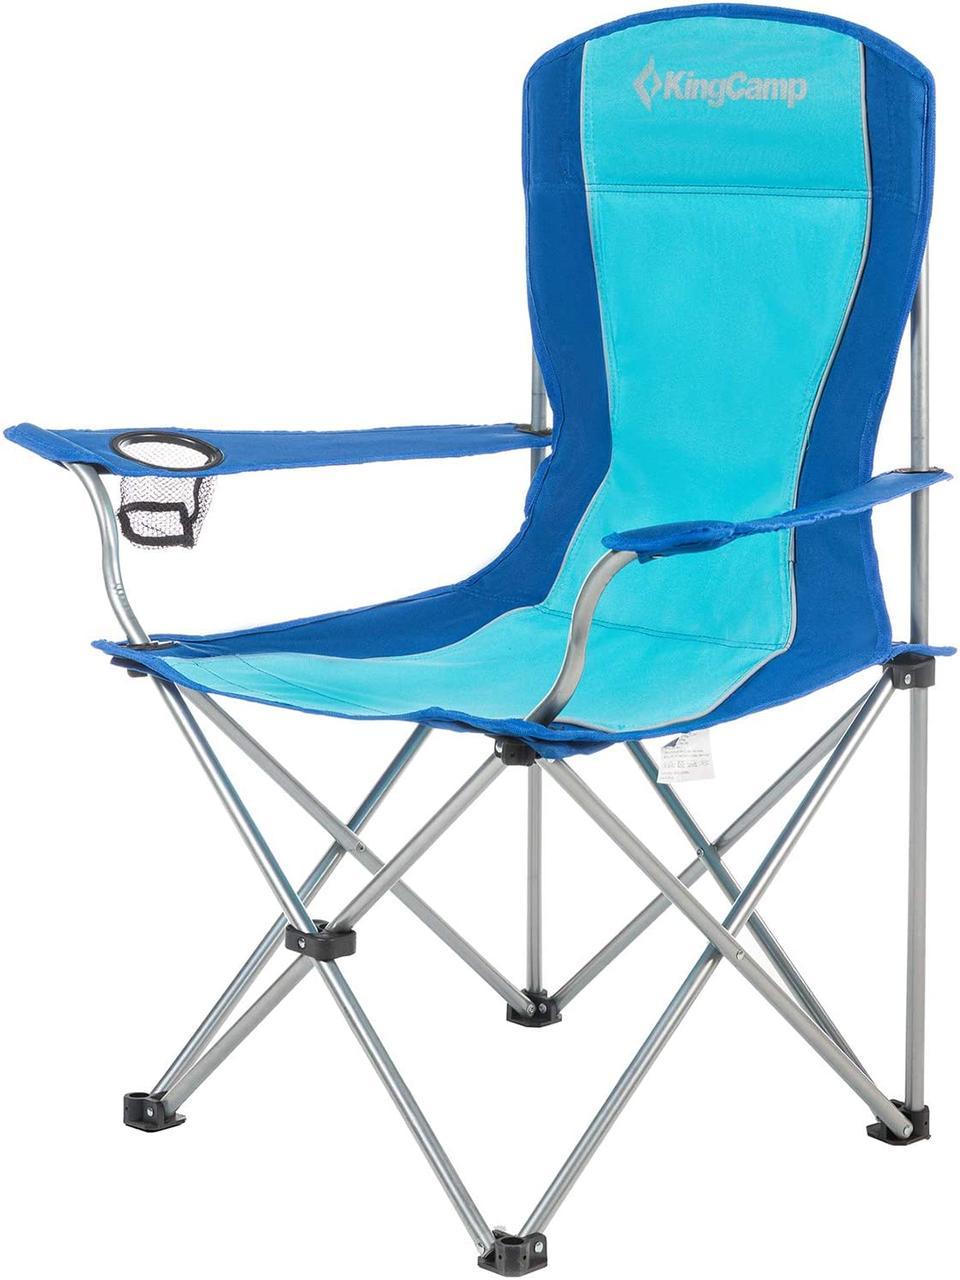 Розкладне крісло KingCamp Arms Chairin Steel Blue (KC3818 Blue)